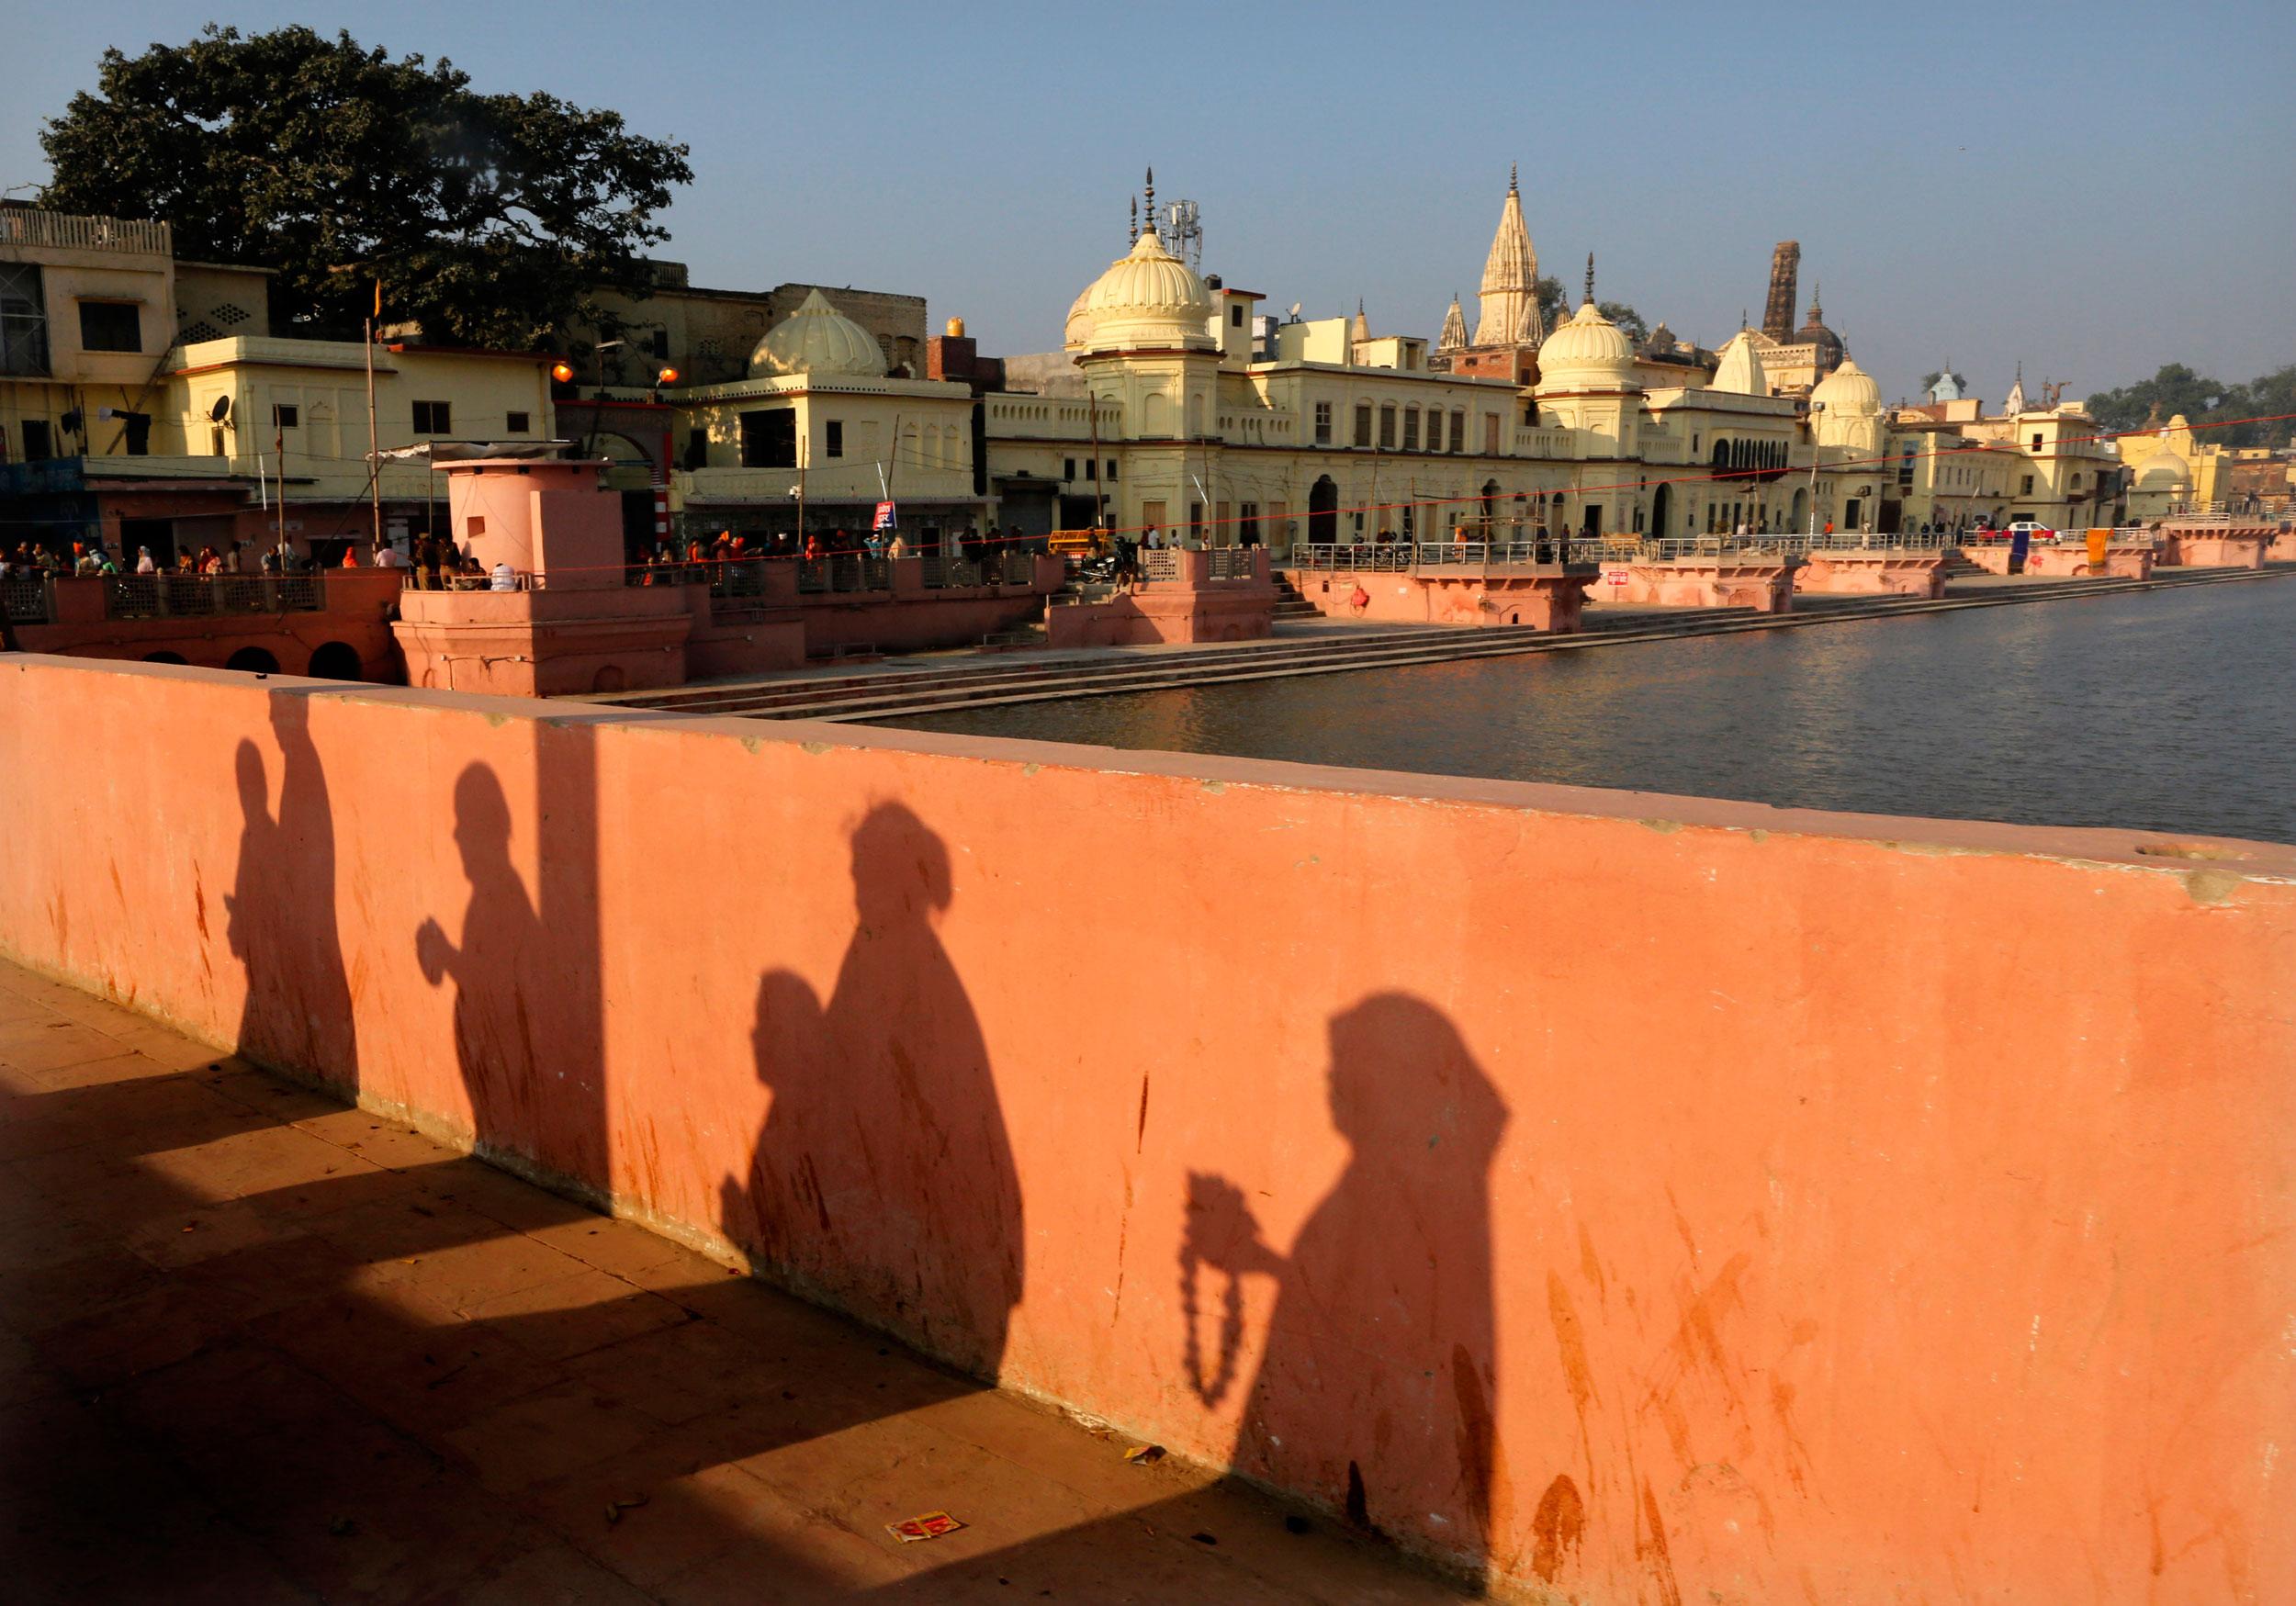 Hindu devotees pray while walking towards a temple in Ayodhya on November 11, 2019.